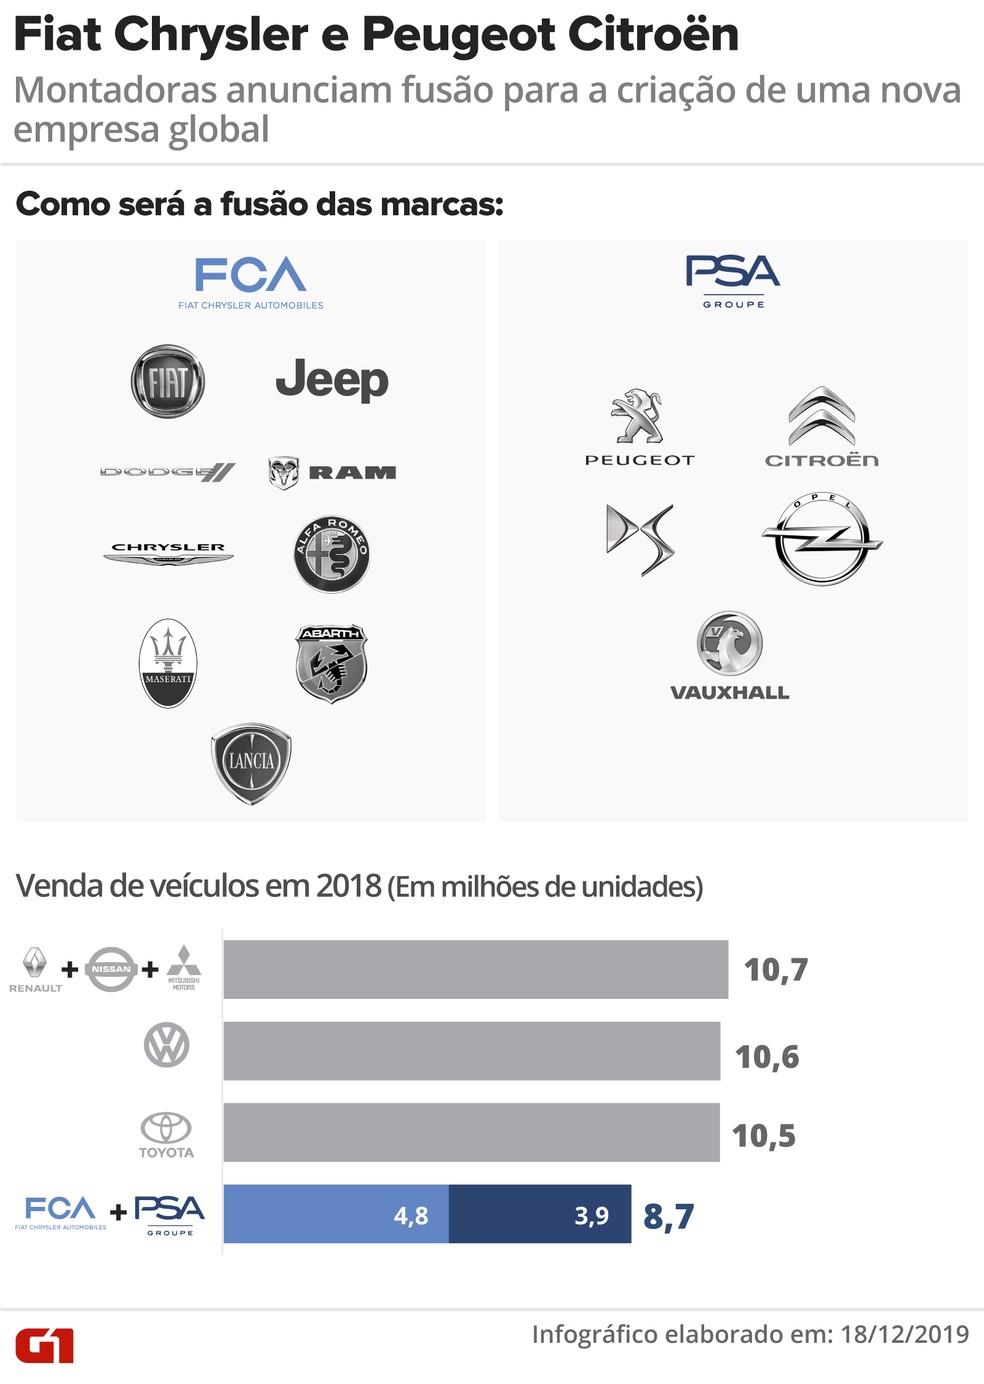 Fiat Chrysler e Peugeot Citröen — Foto: Rodrigo Sanches/G1